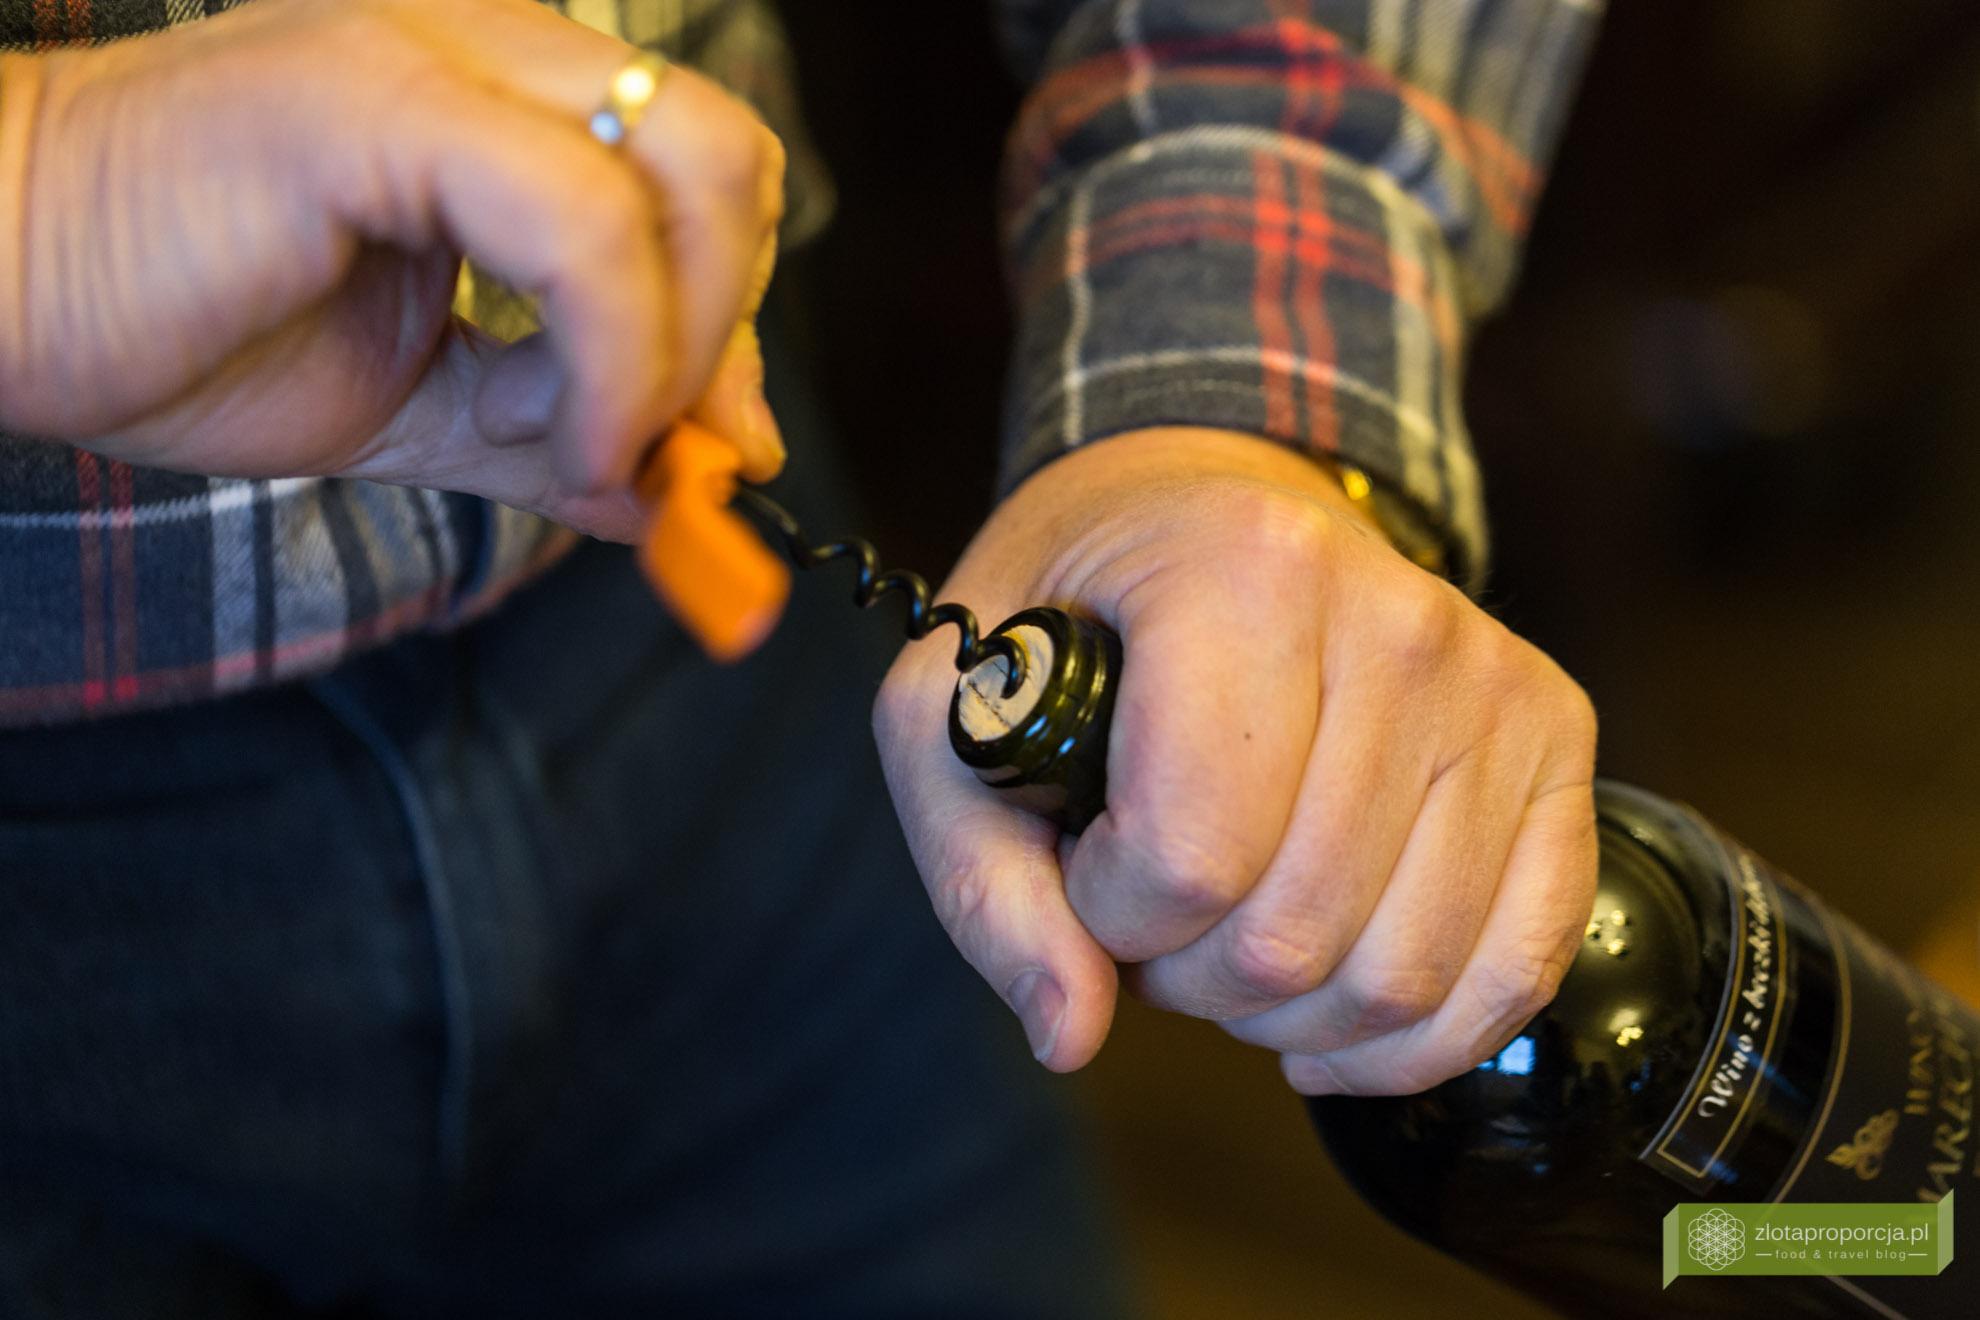 winnica Zamkowa, Karpacki Szlak Wina, winnice na Podkarpaciu, winnice Podkarpacia,